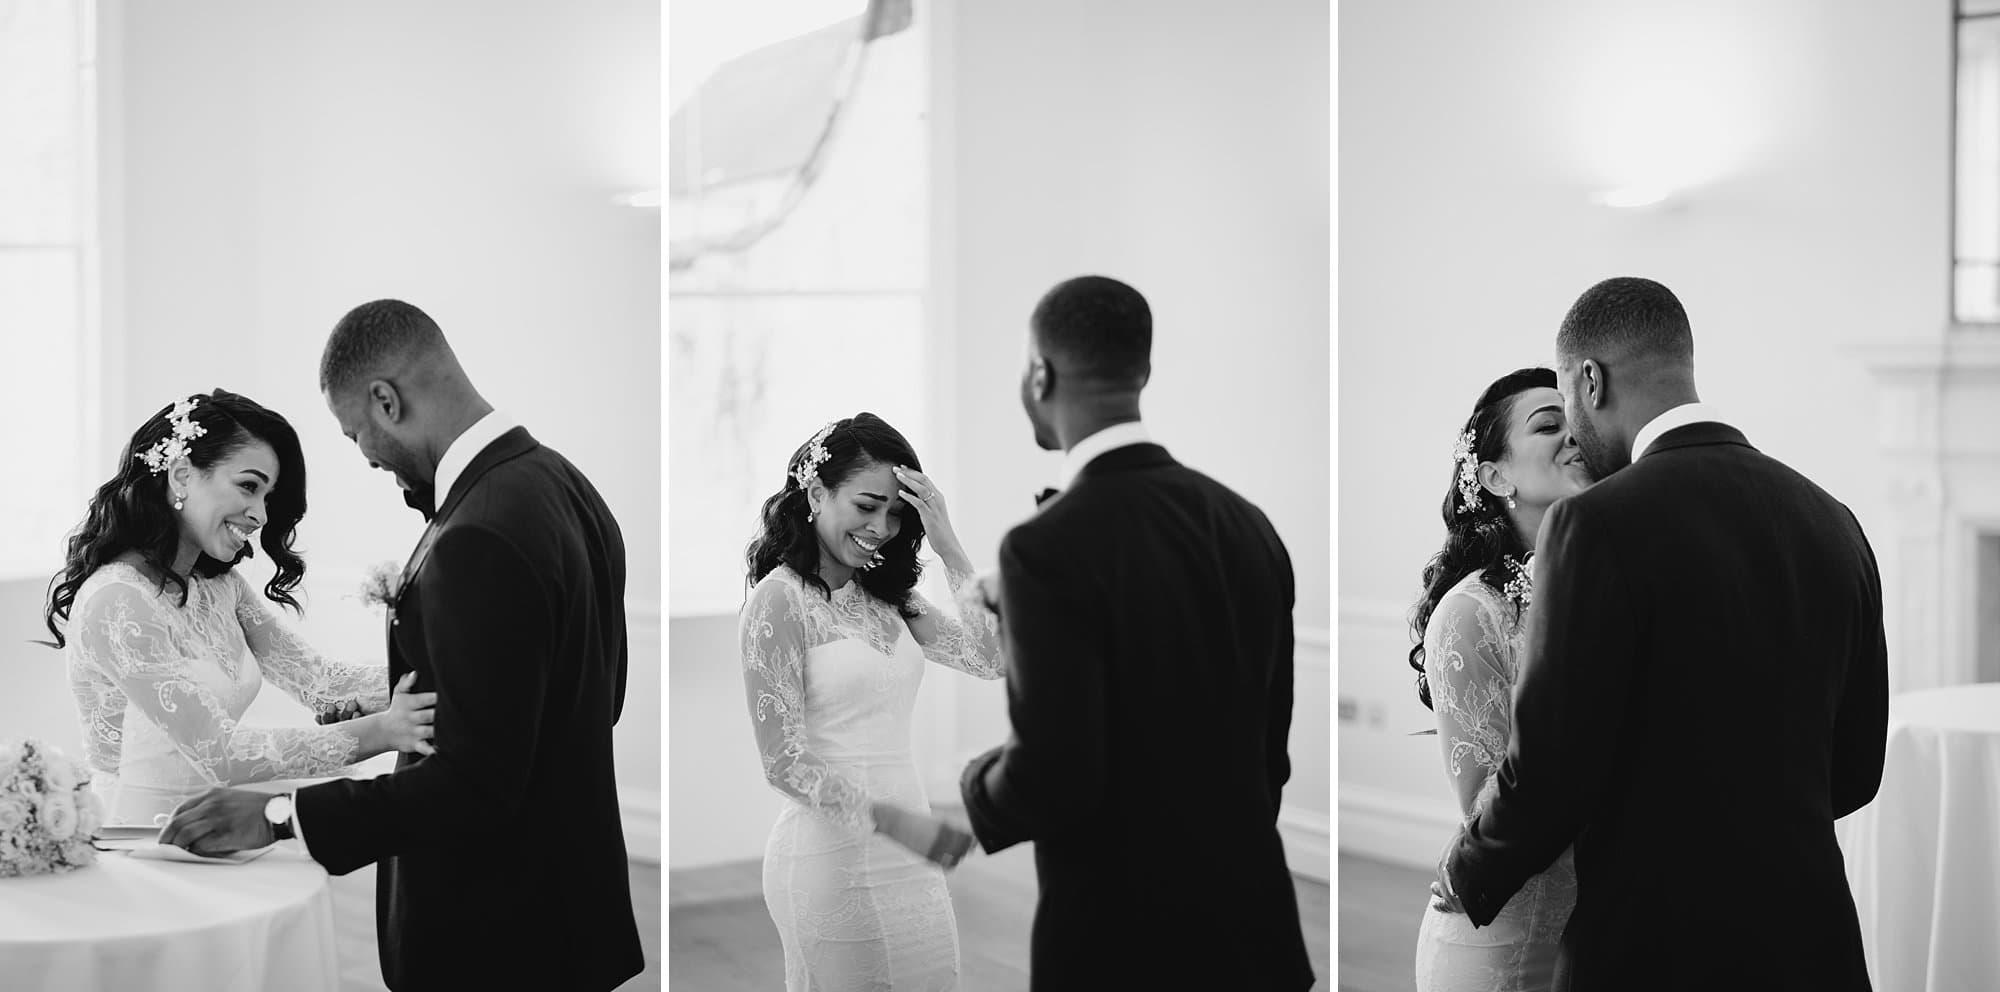 asia house london wedding photographer 009 - Rachel + Gabriel   Asia House Wedding Photography